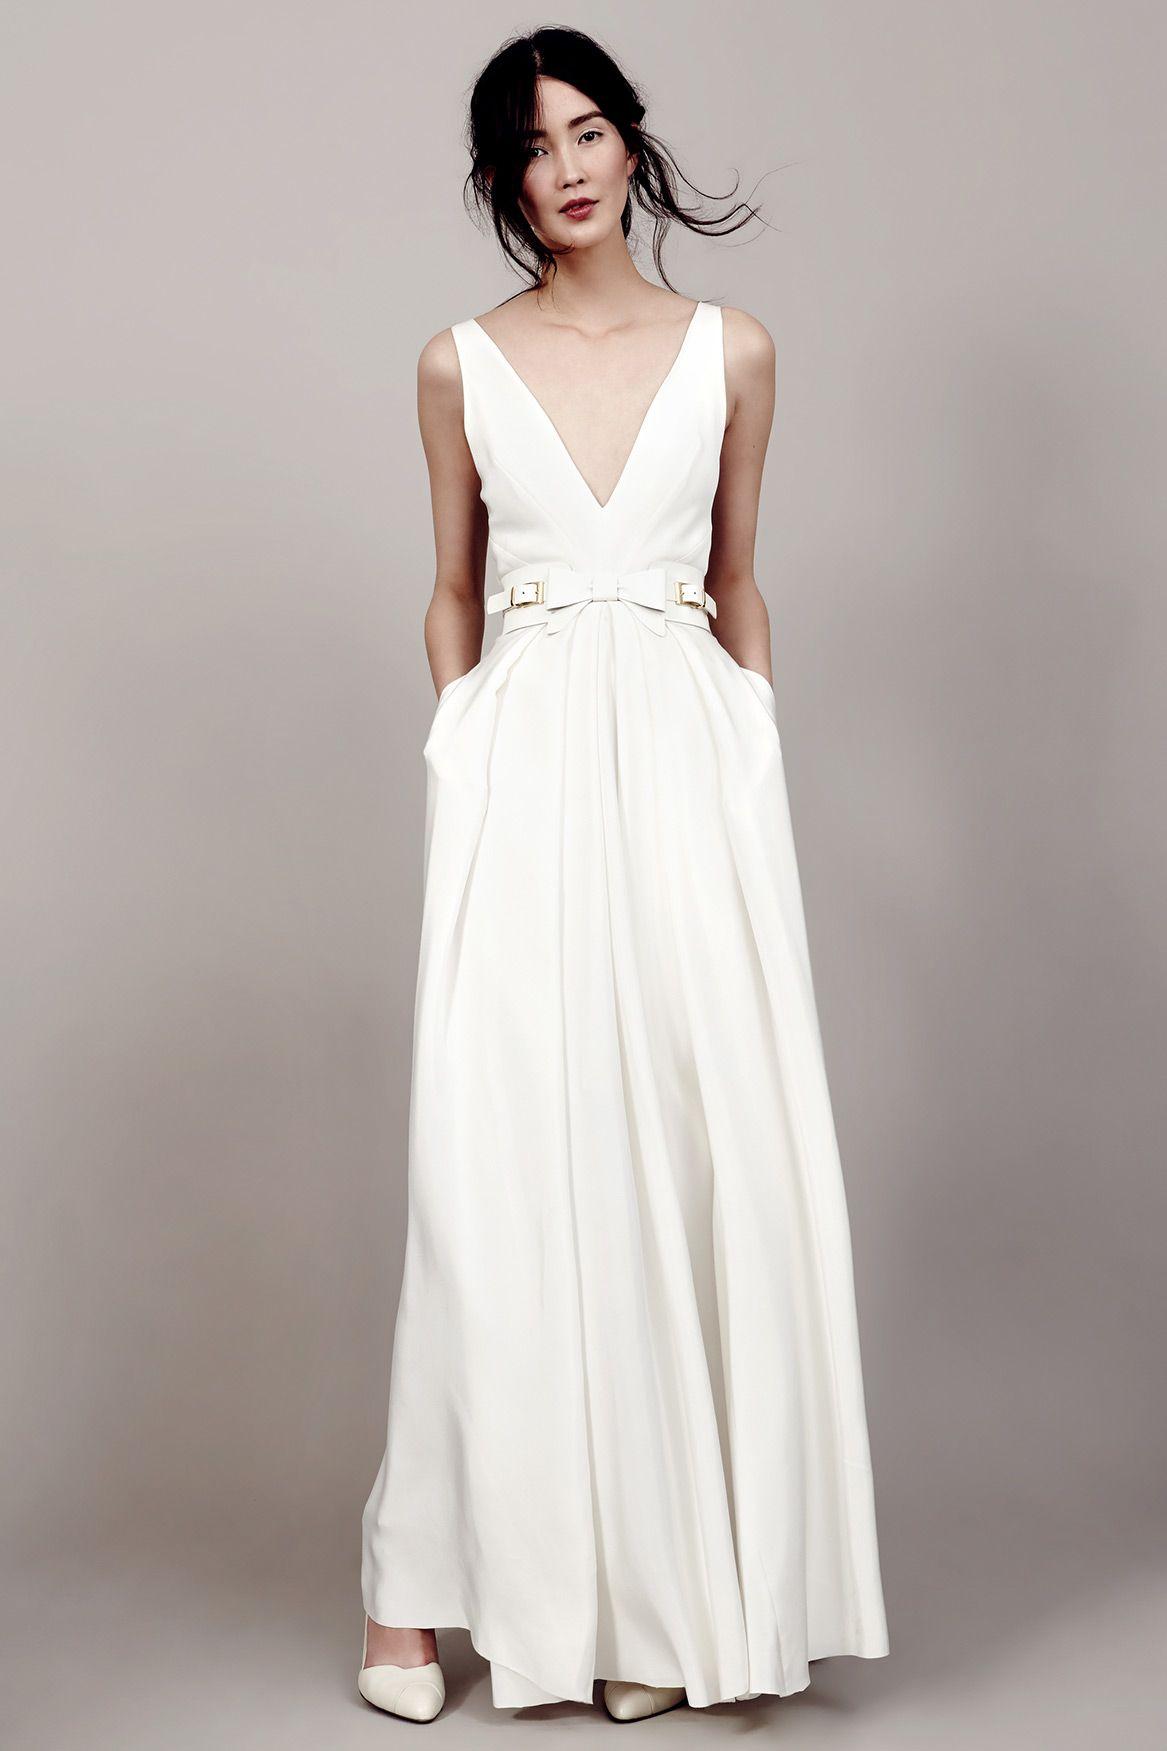 Duchesse Dress (2015) - Luxury, extravagant silk meets a modern, up ...